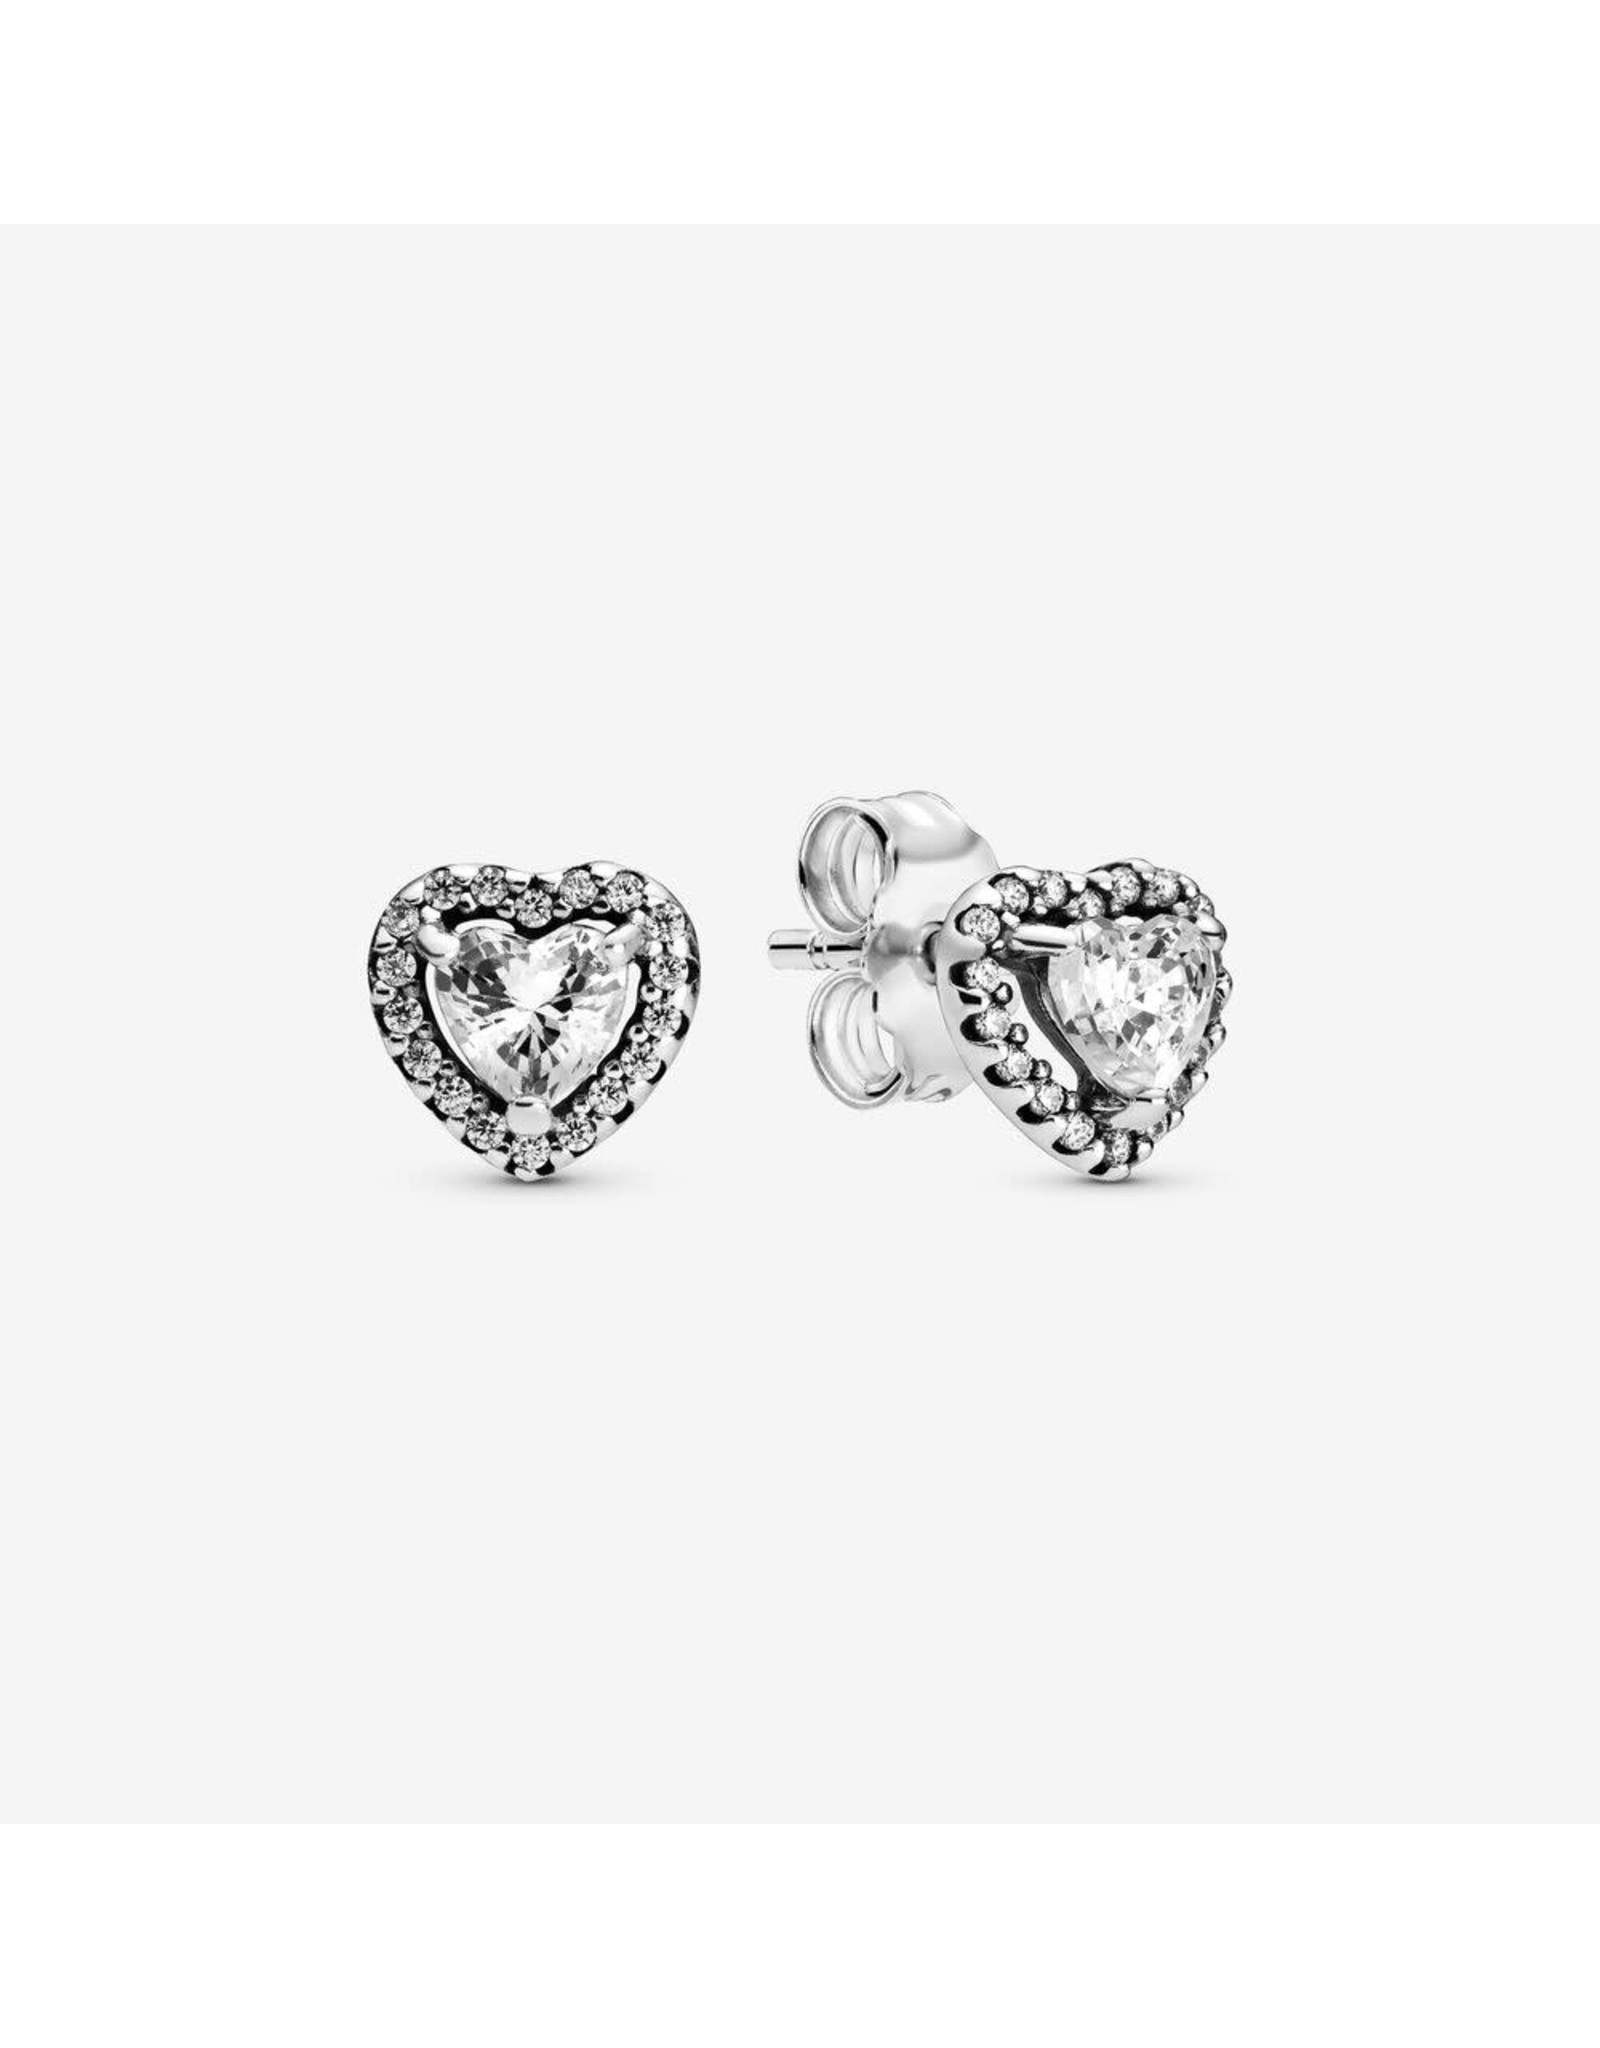 Pandora Pandora Earrings298427C01, Heart Sterling Silver